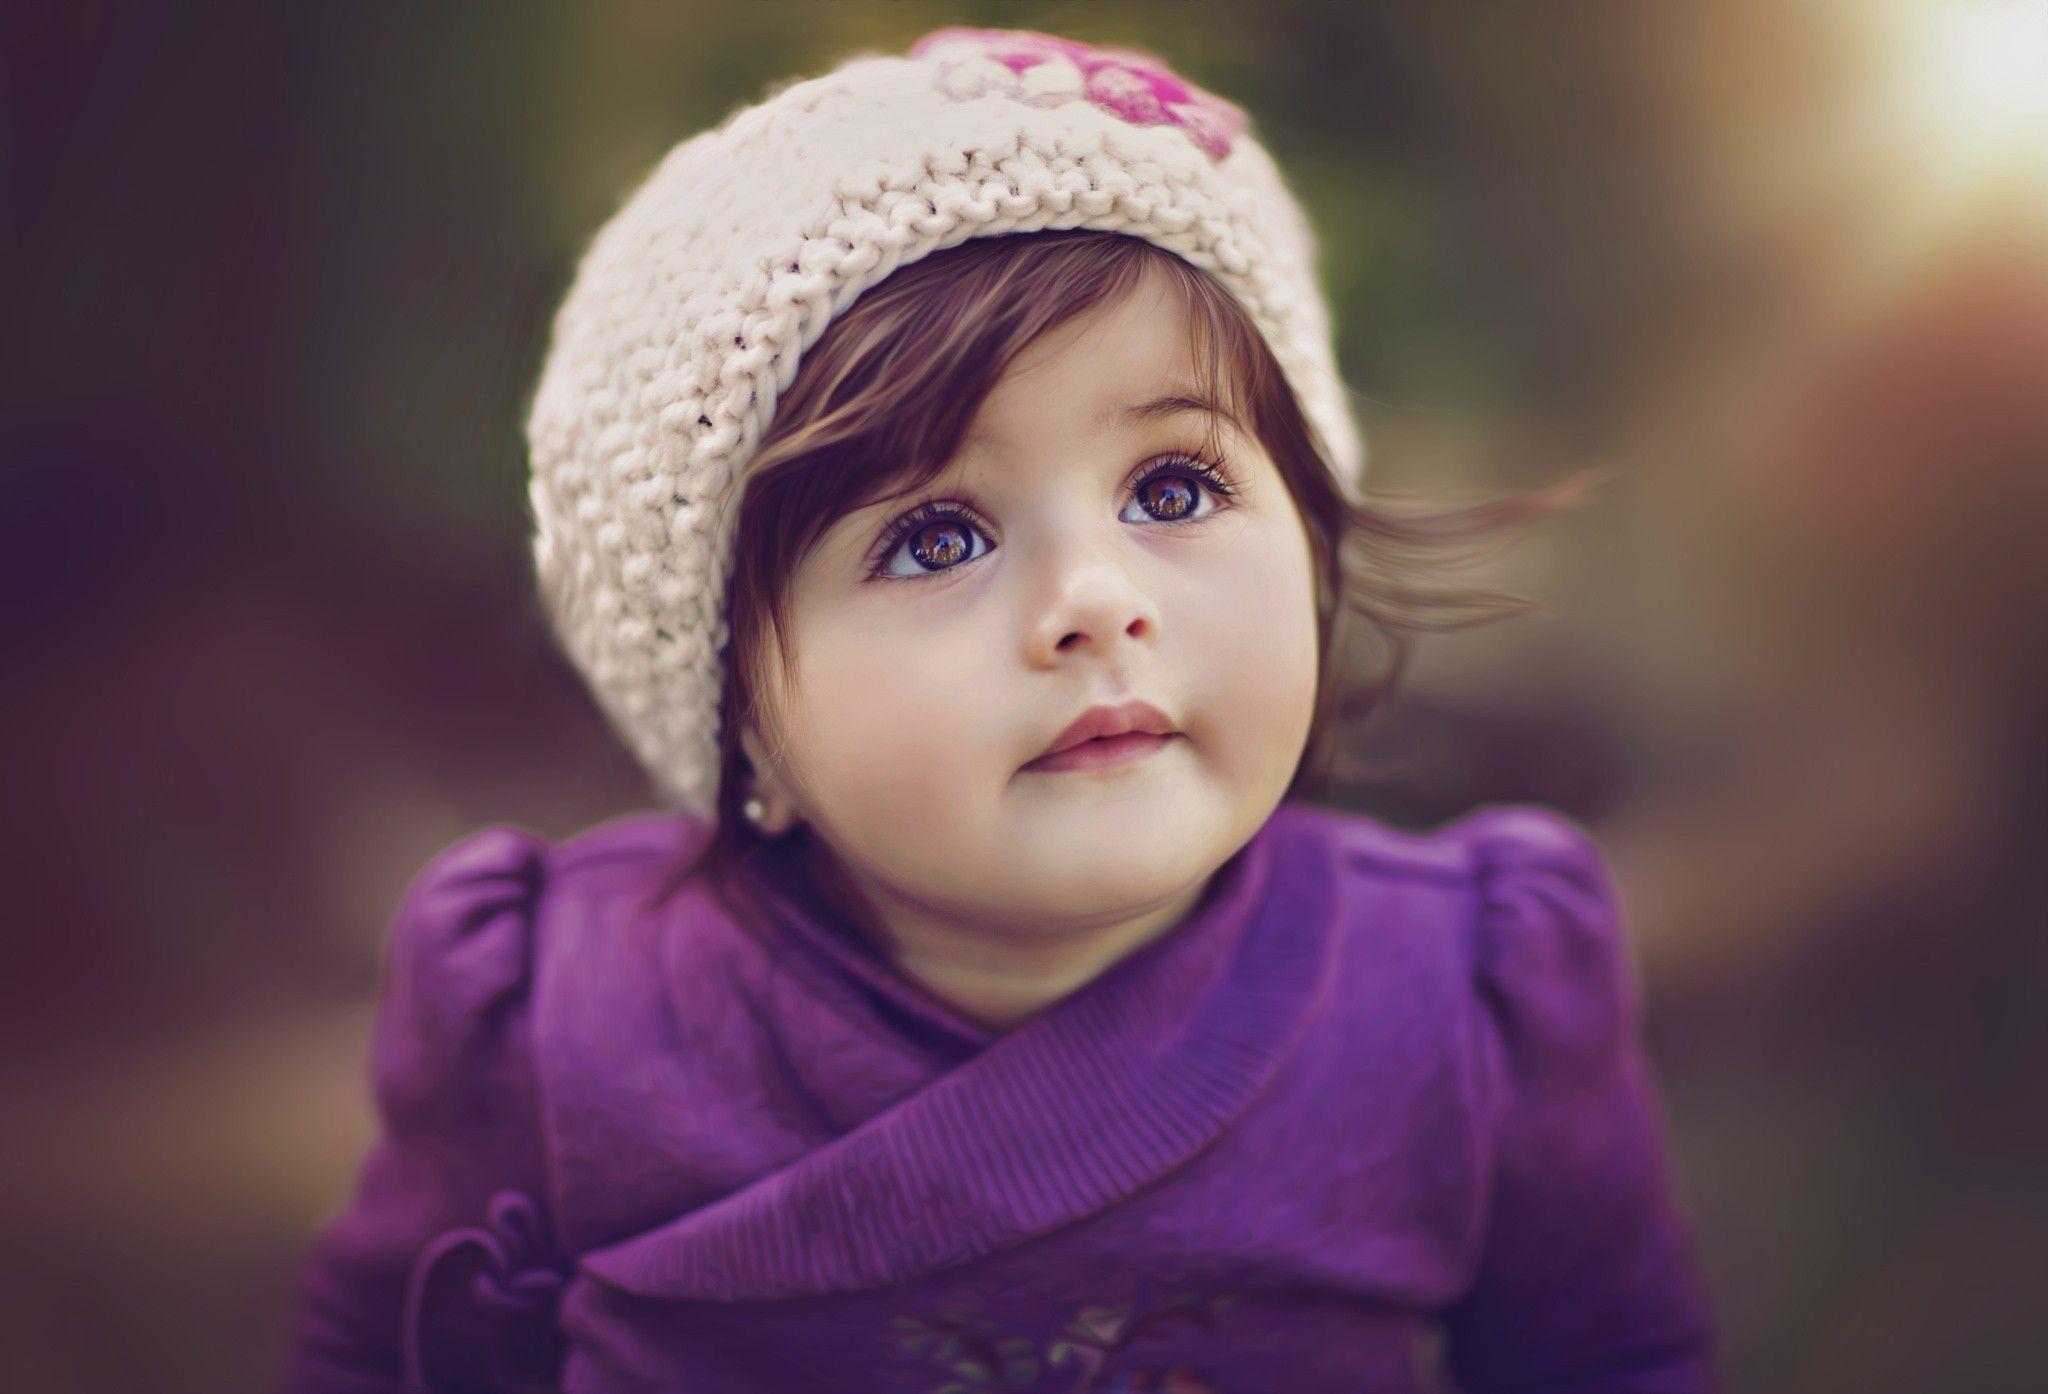 Sweet Baby Girl Wallpapers Hd 2048x1394 Wallpaper Cart In 2020 Cute Baby Girl Wallpaper Cute Baby Wallpaper Baby Girl Wallpaper